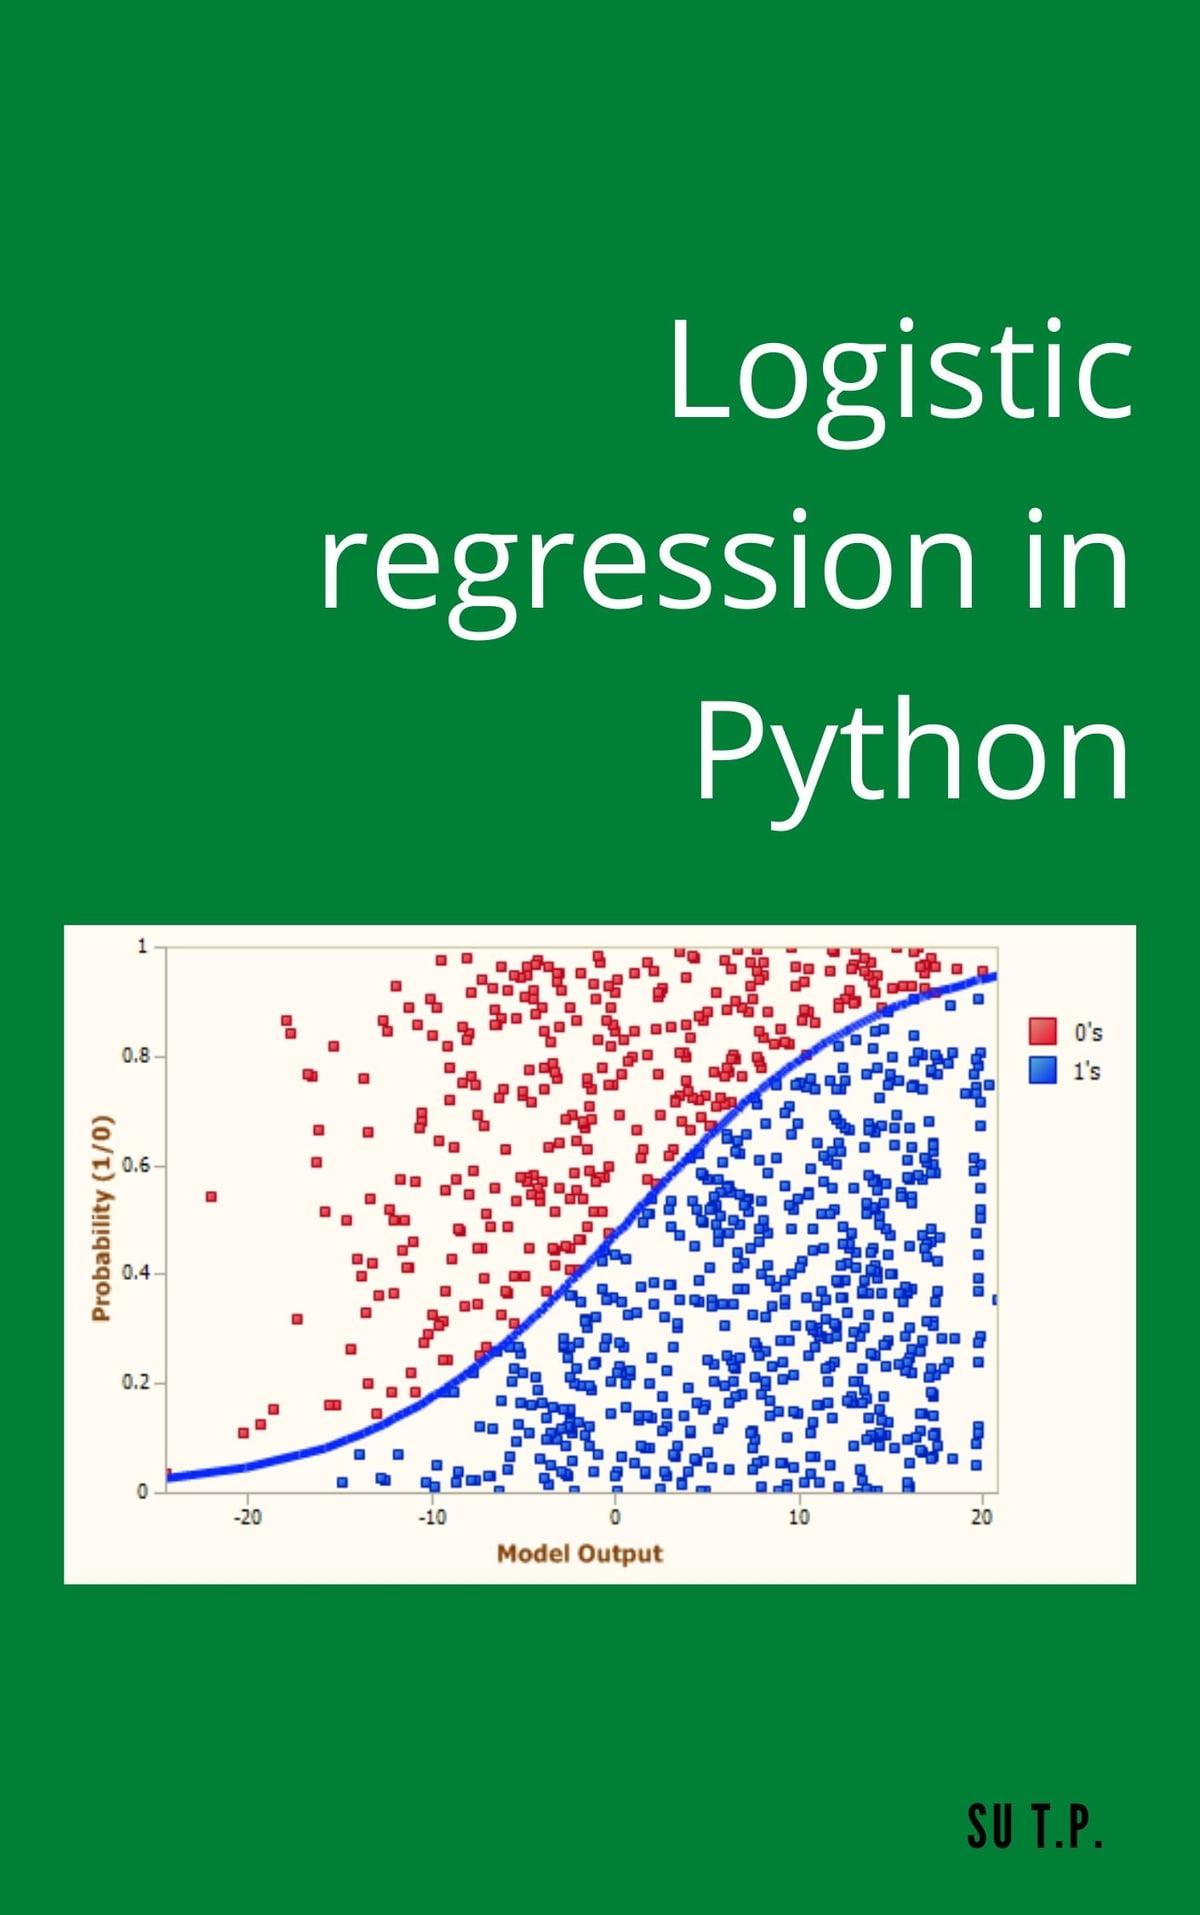 Logistic Regression in Python eBook by Su TP - 1230003759066 | Rakuten Kobo United States